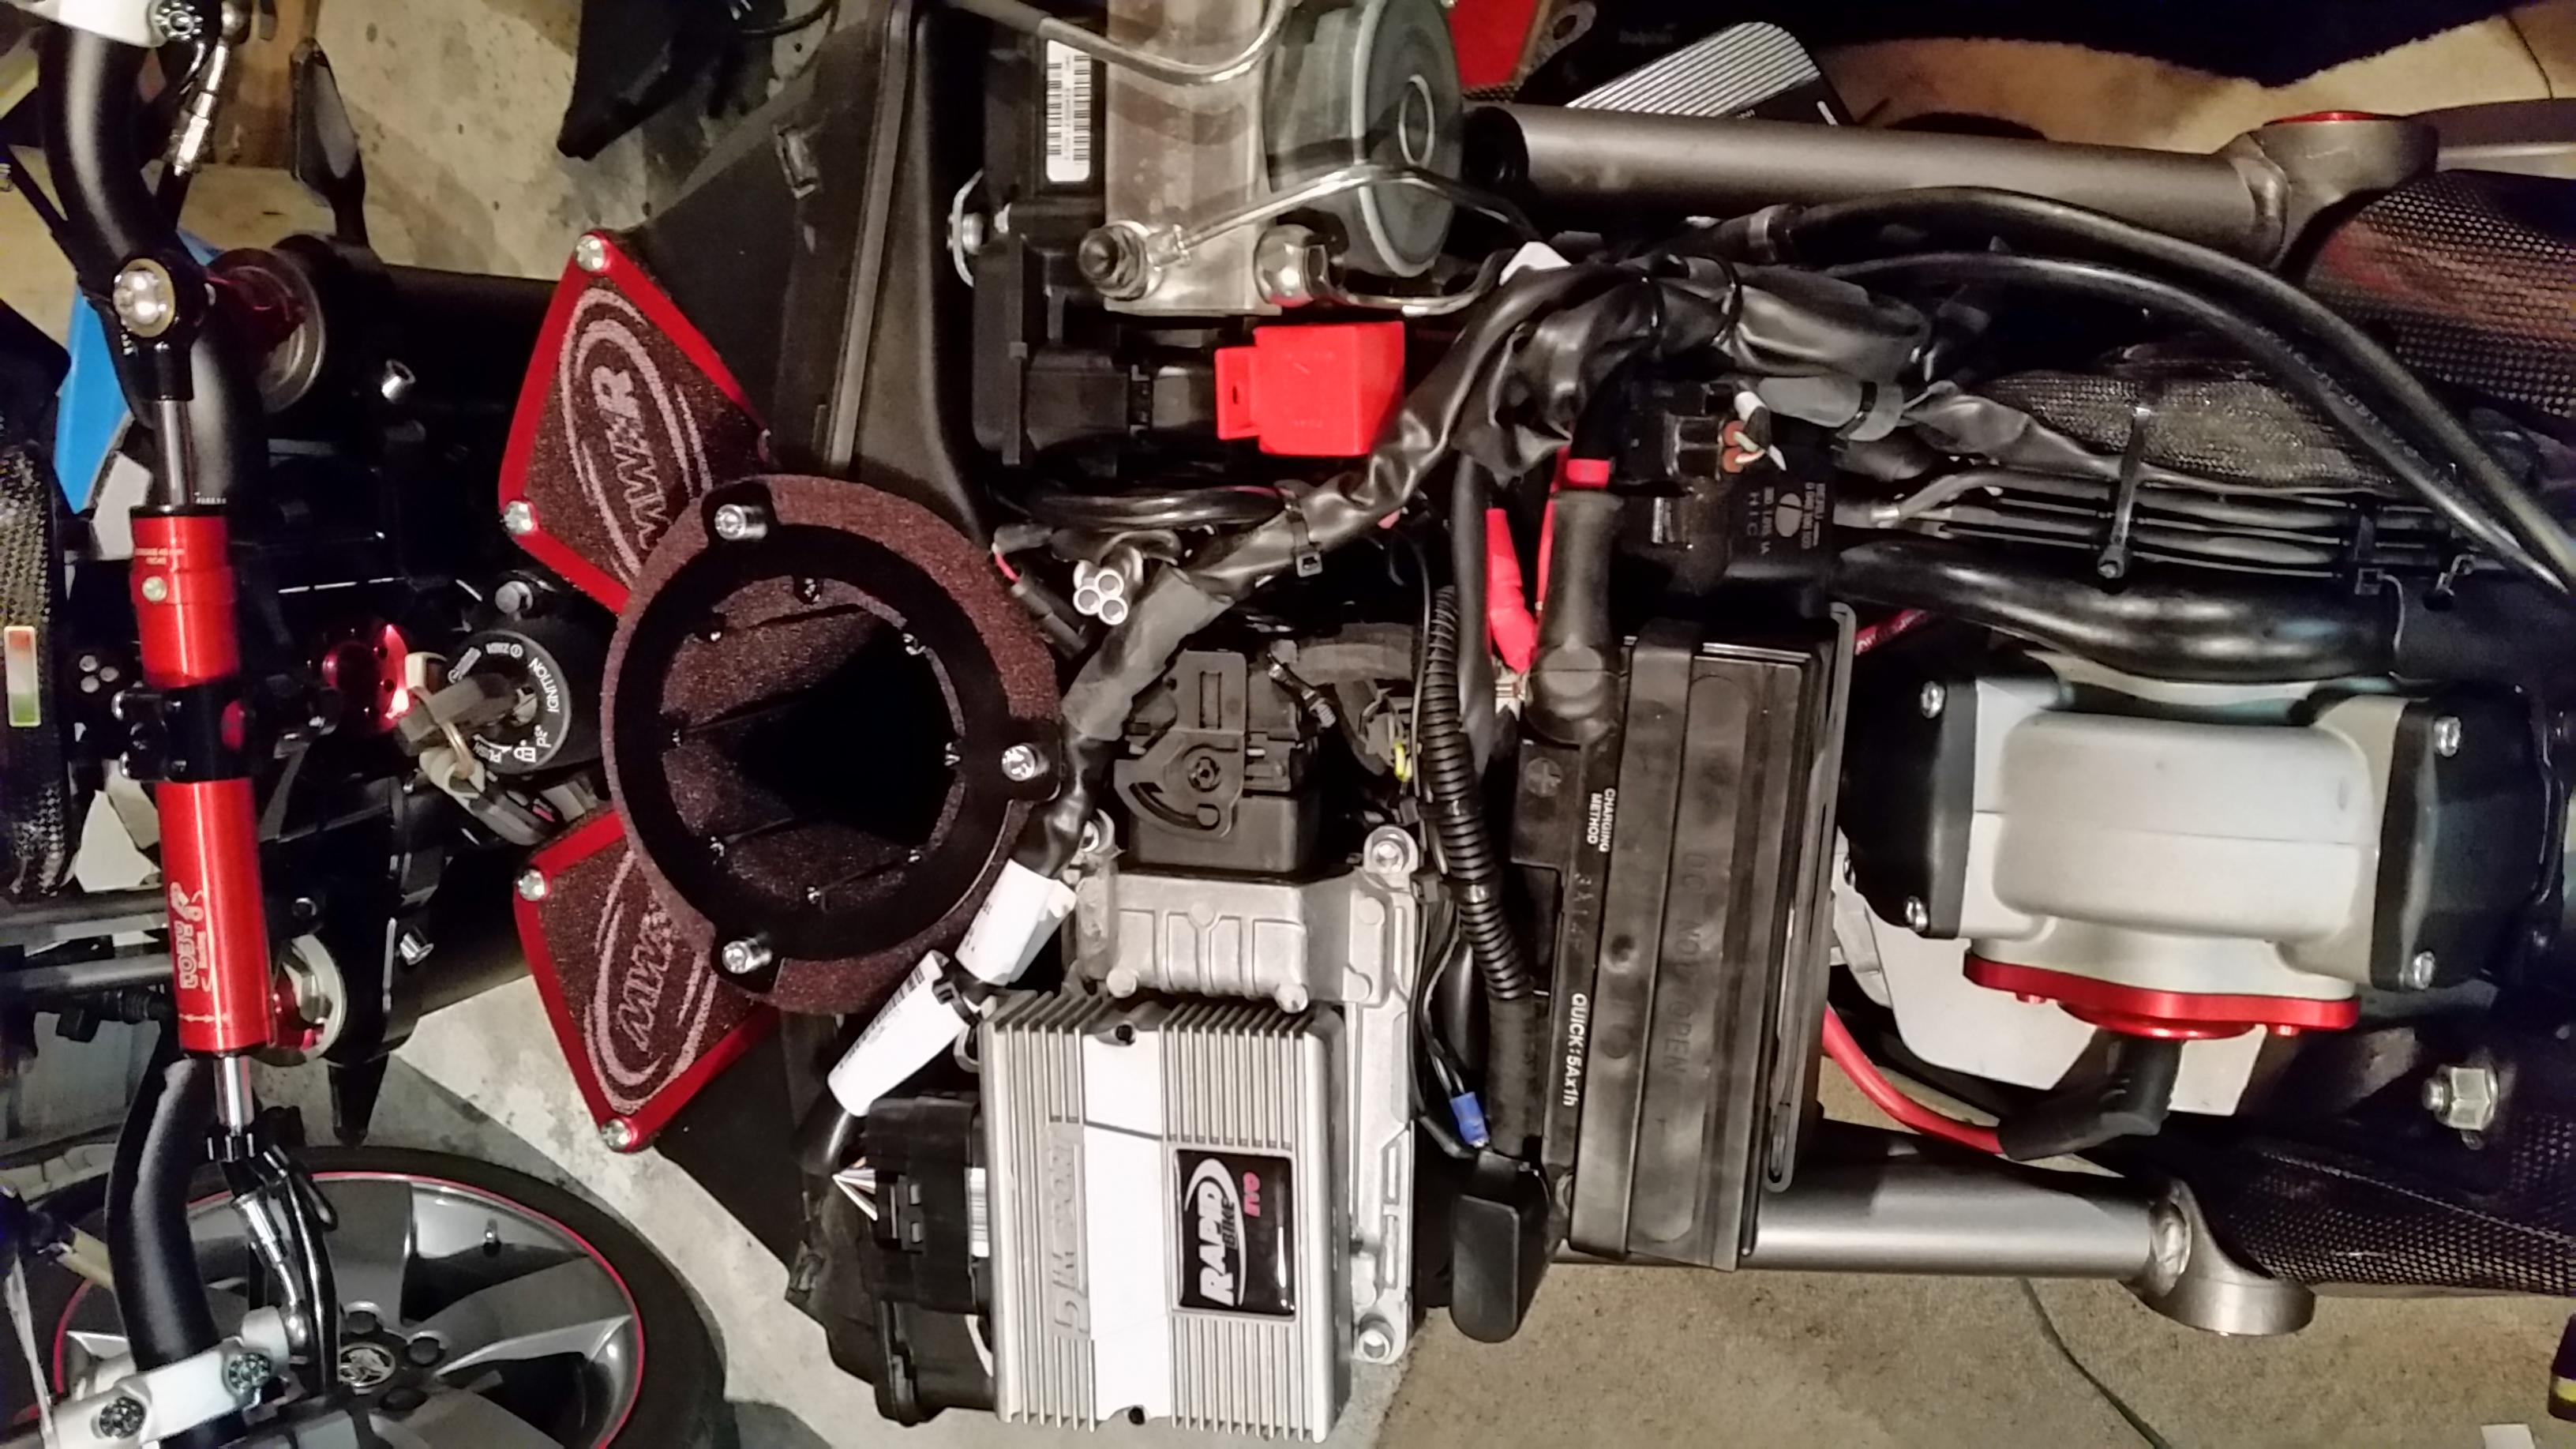 Wiring Diagram And More Ducati Monster Wiring Diagram Wiring Diagram